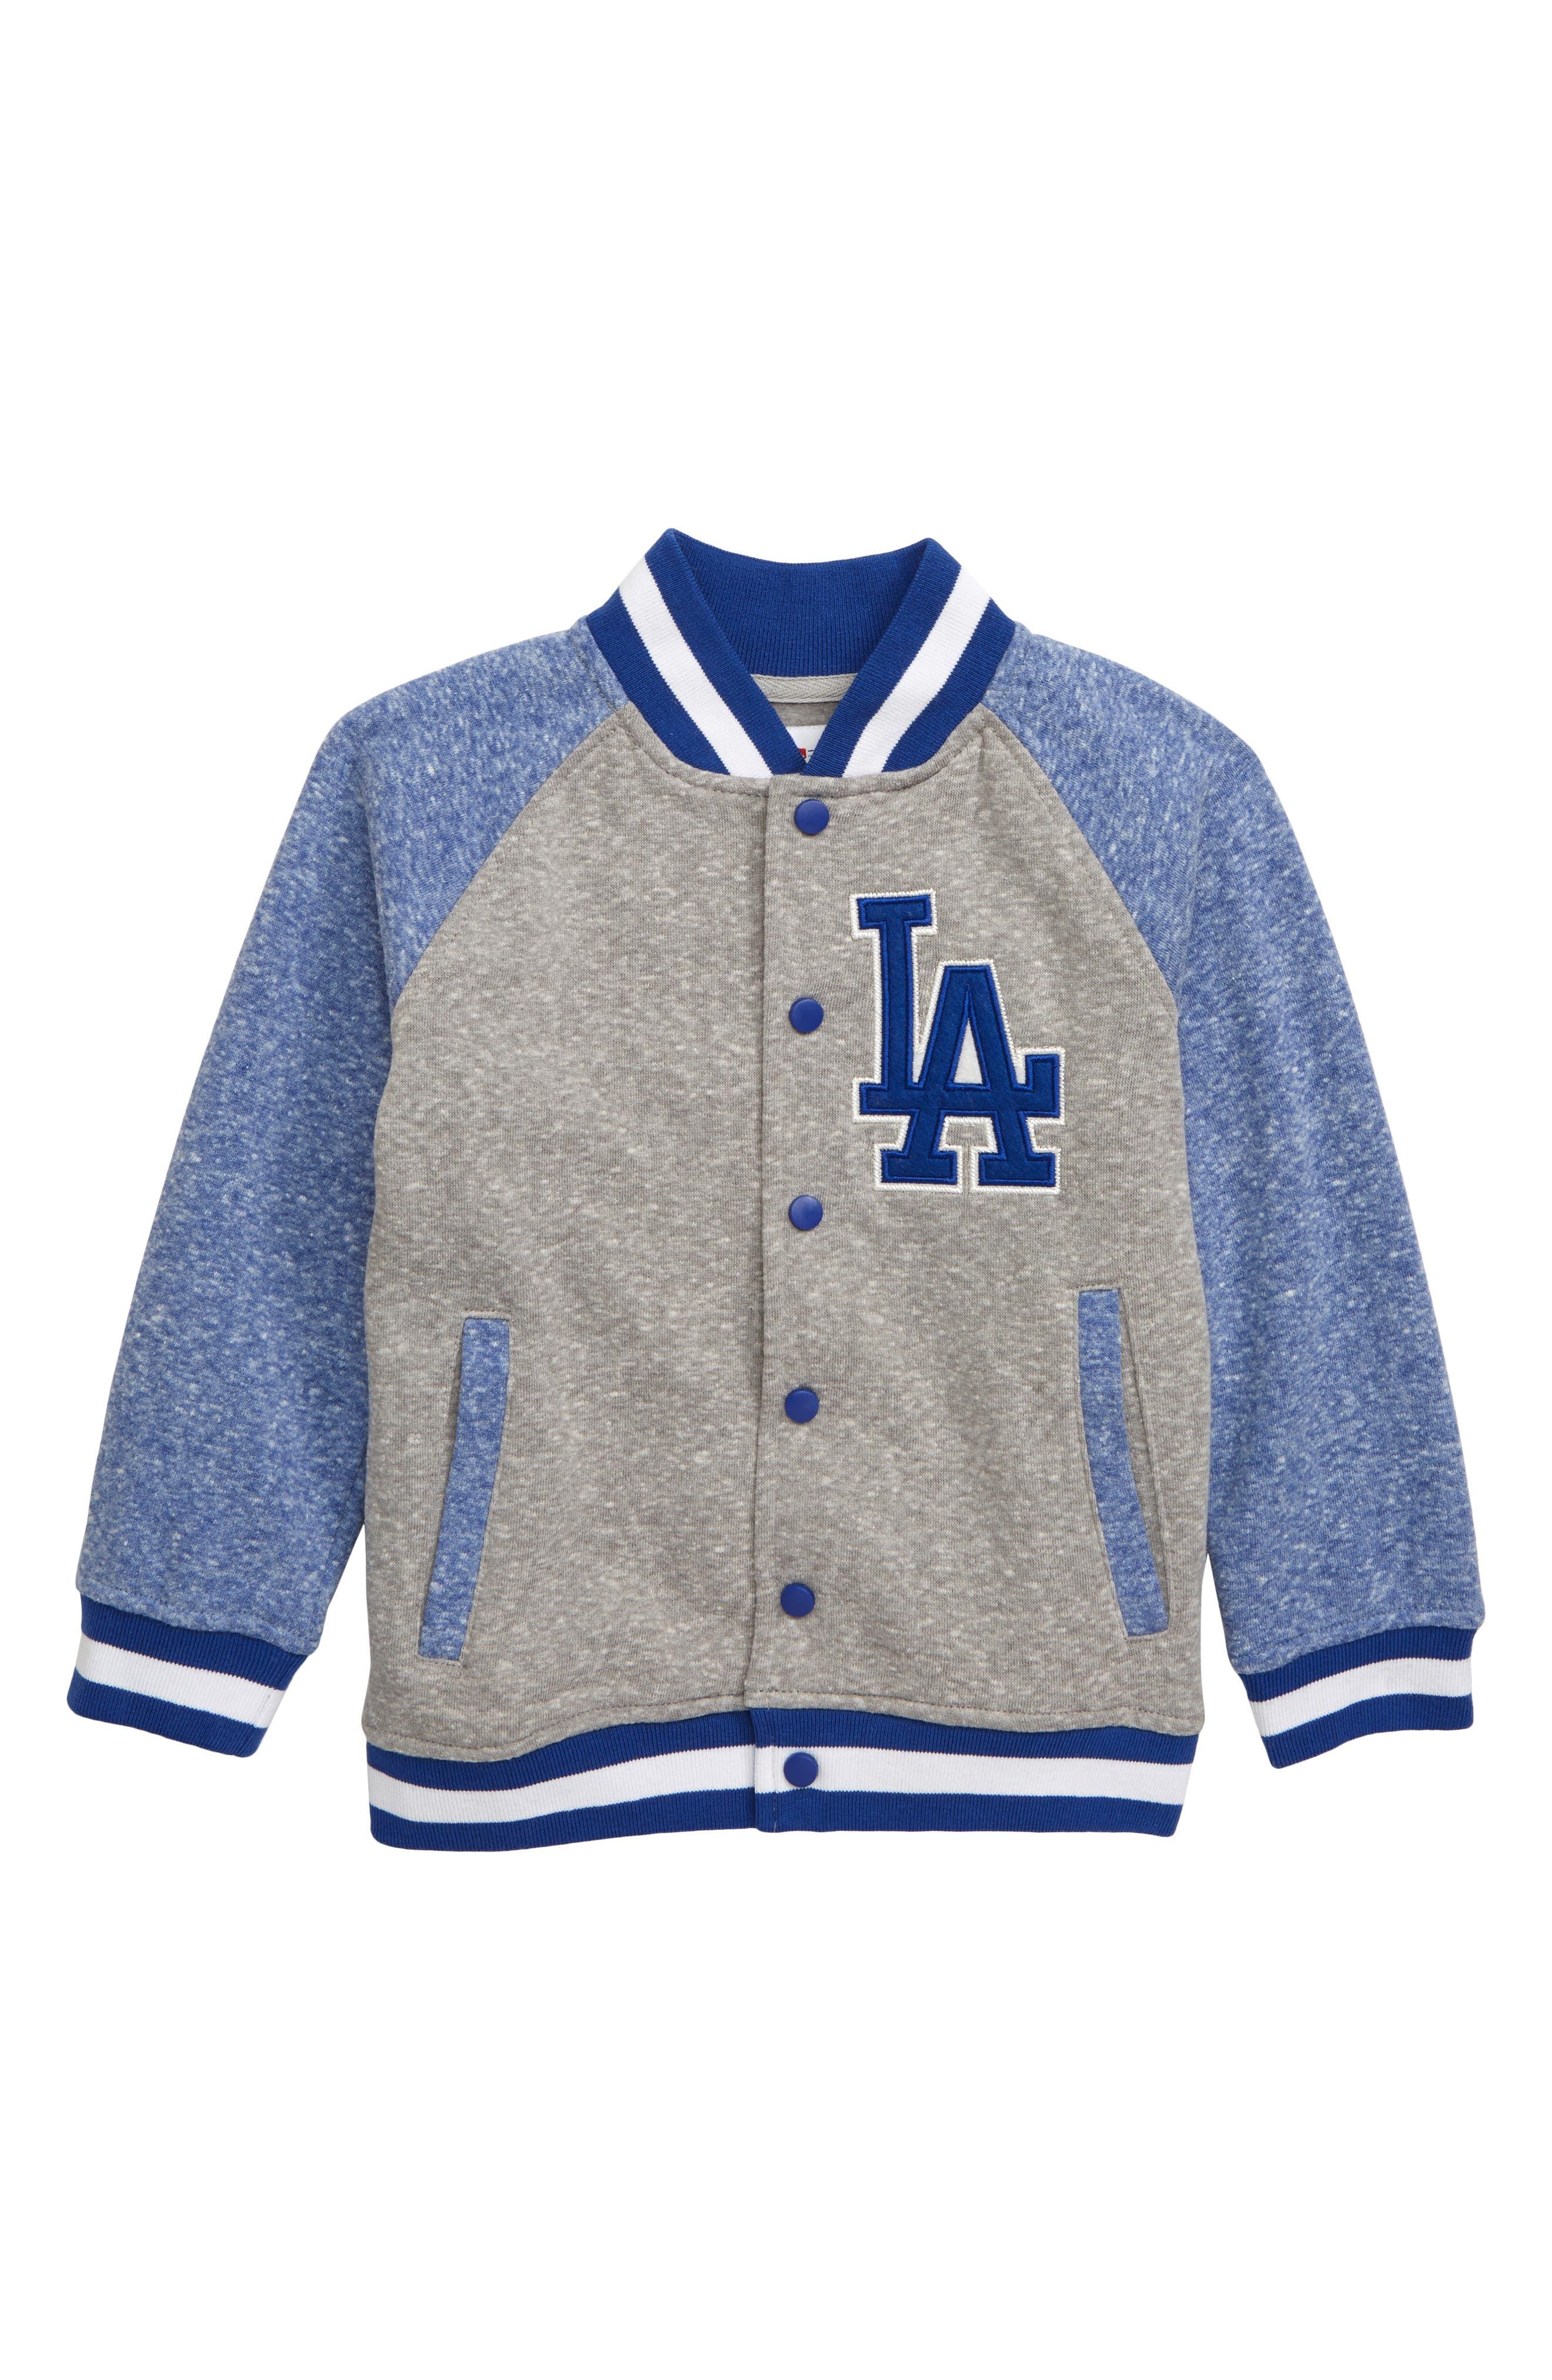 MAJESTIC MLB, Los Angeles Dodgers Pride Fleece Bomber Jacket, Main thumbnail 1, color, ROYAL BLUE